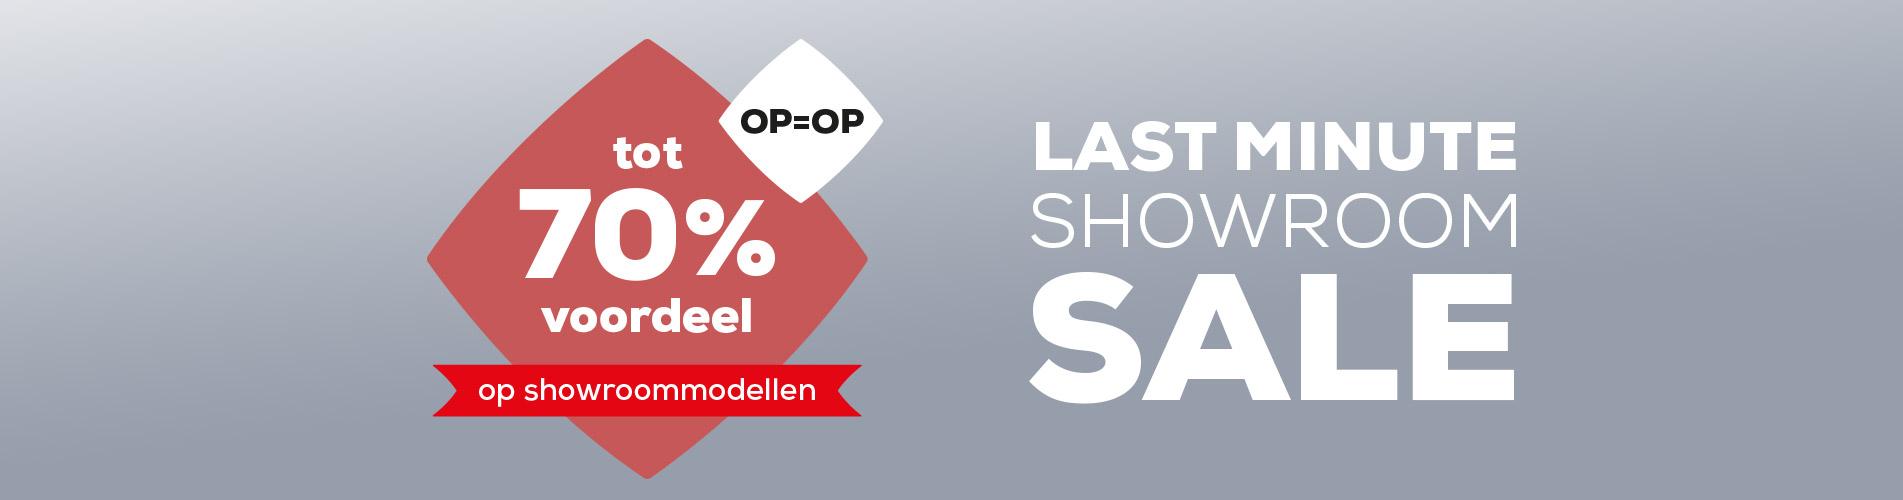 Acties Last Minute Showroom Sale | Swiss Sense